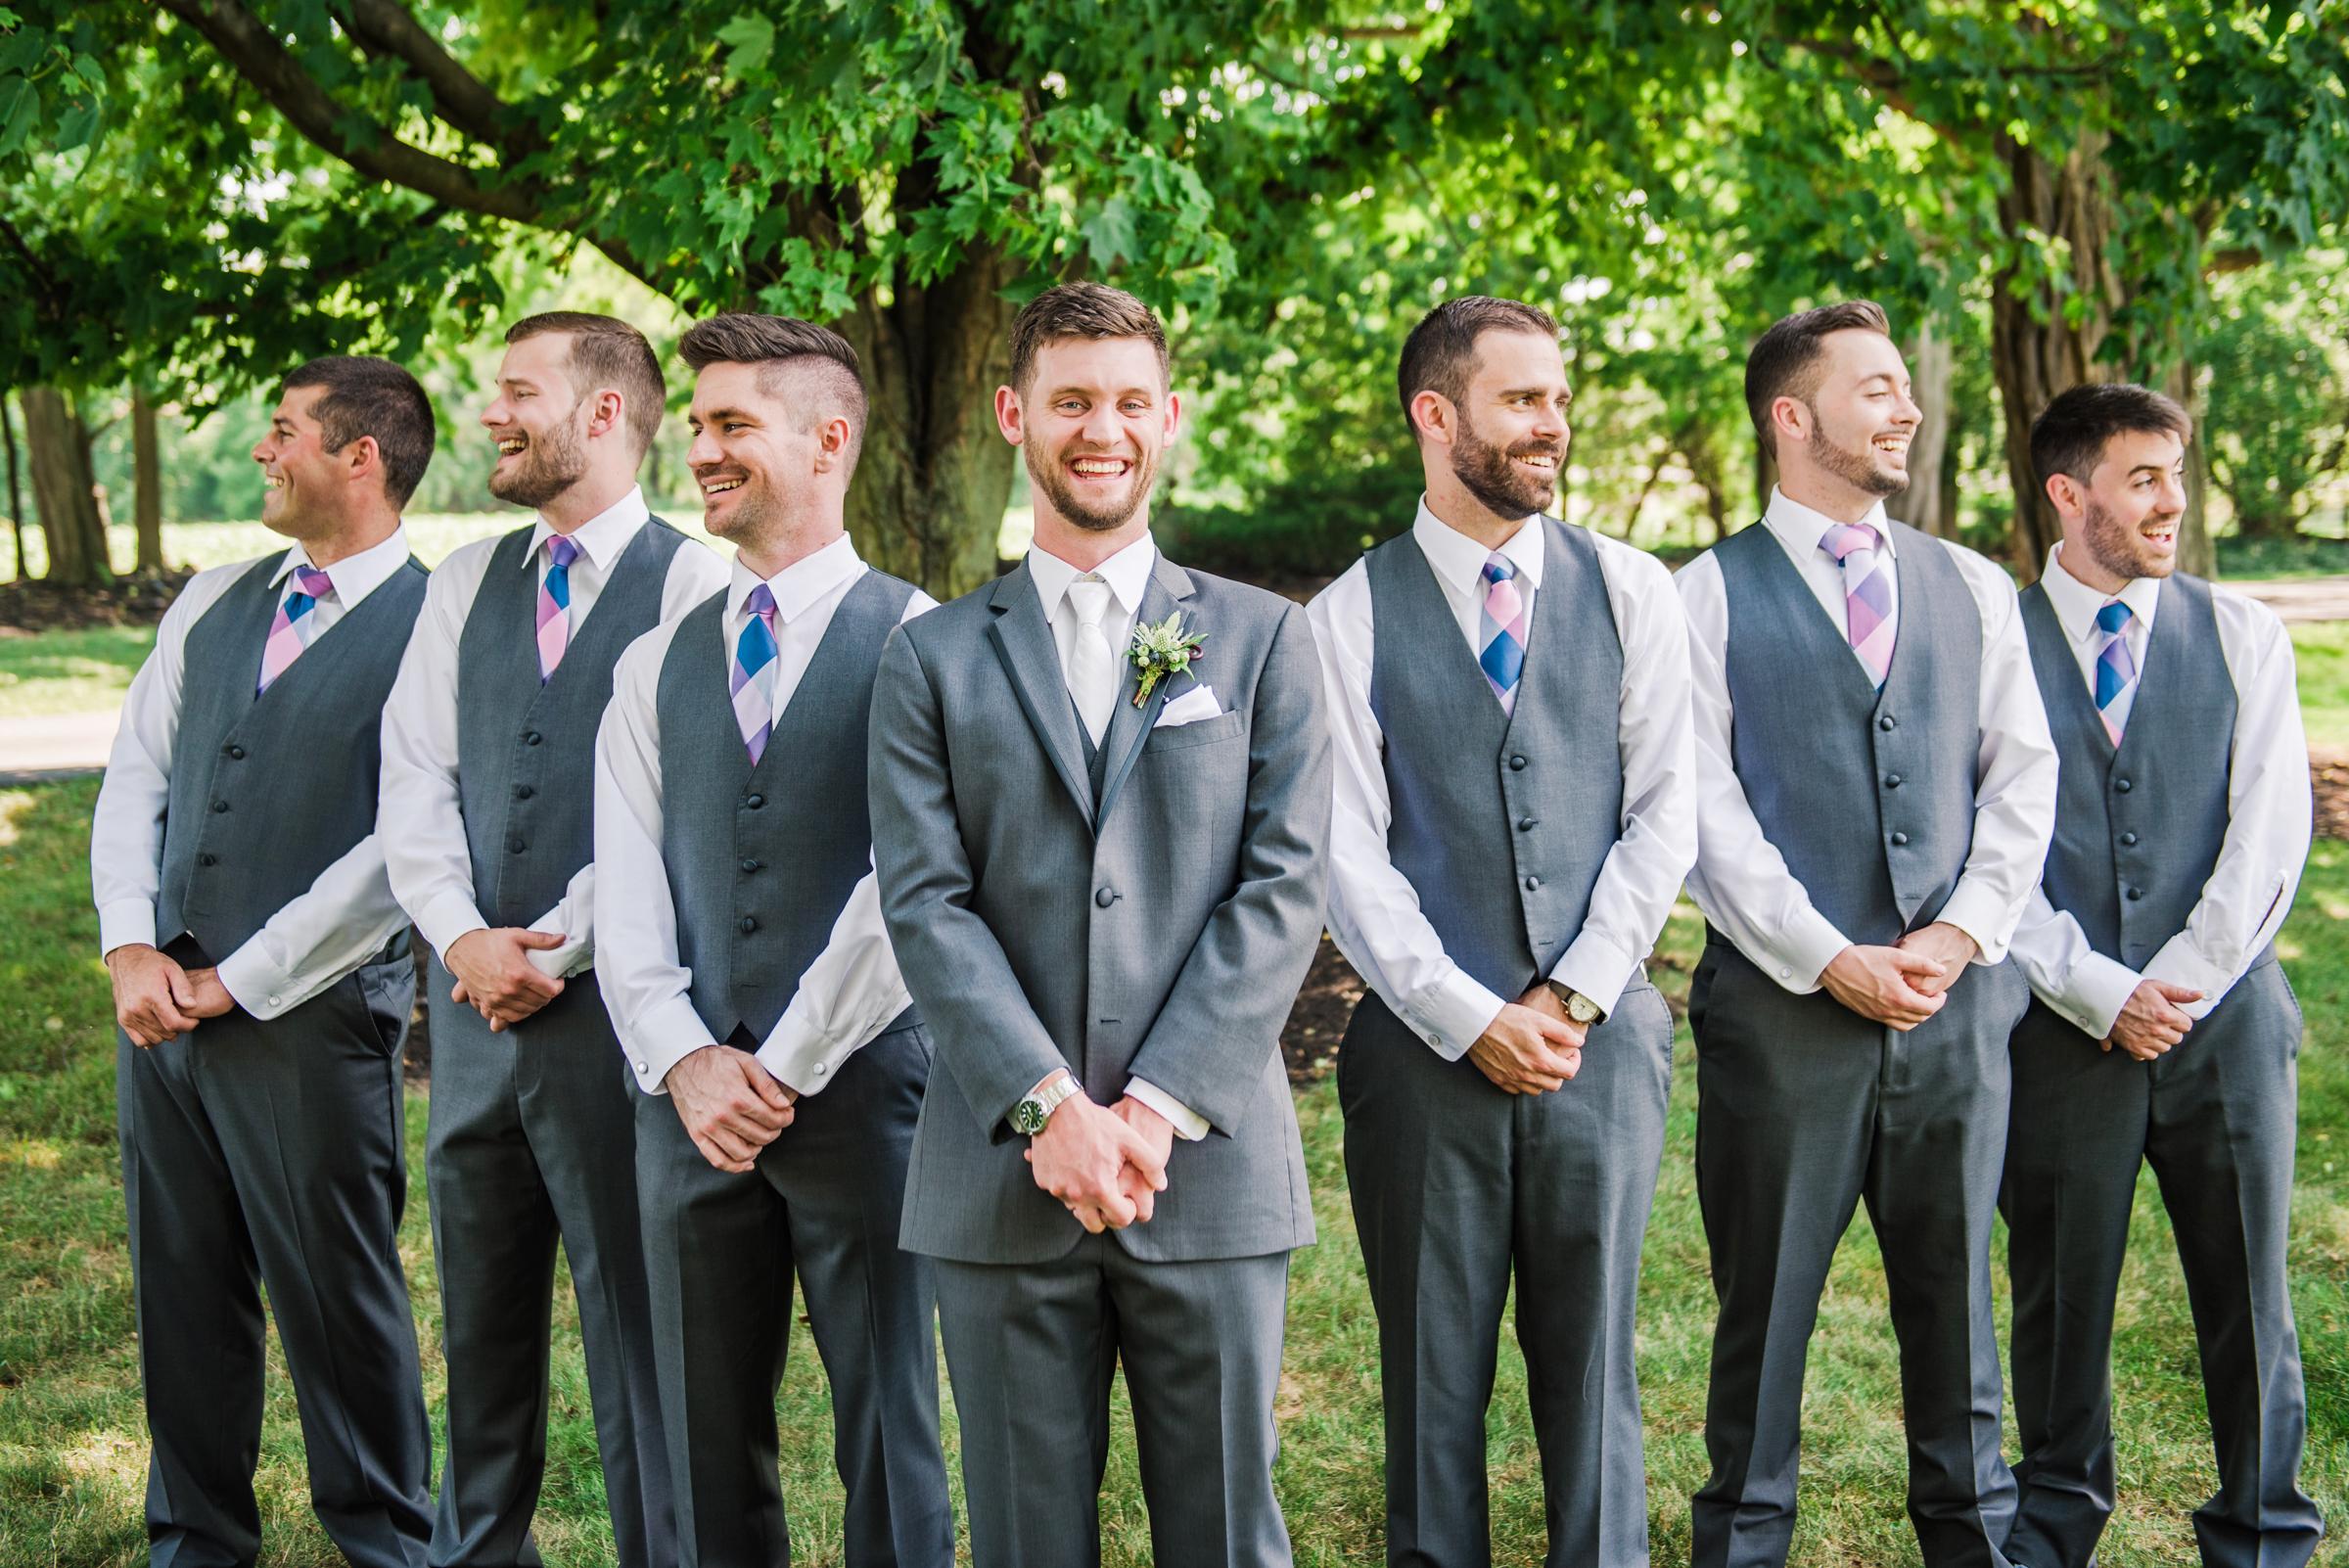 Jerris_Wadsworth_Wedding_Barn_Rochester_Wedding_JILL_STUDIO_Rochester_NY_Photographer_DSC_2425.jpg